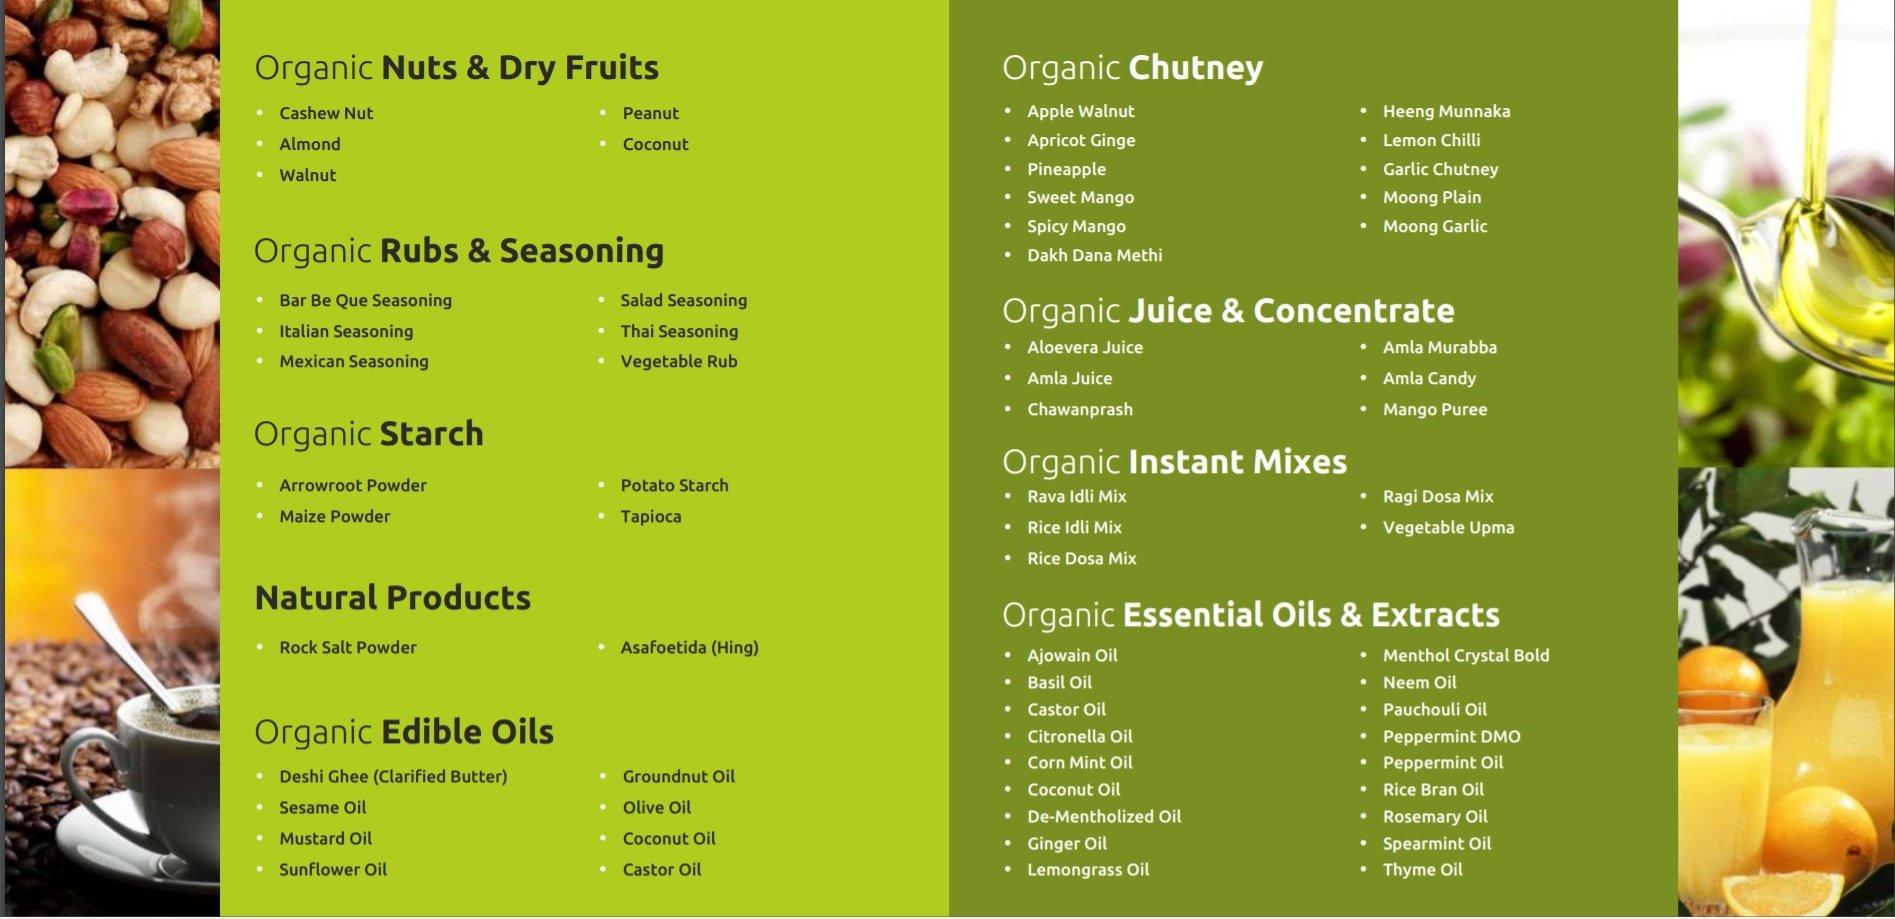 Organic Moong Dal Split Without Skin (Moong Mogar) 4 Pounds, USDA Organic, Non-GMO - Green Sense